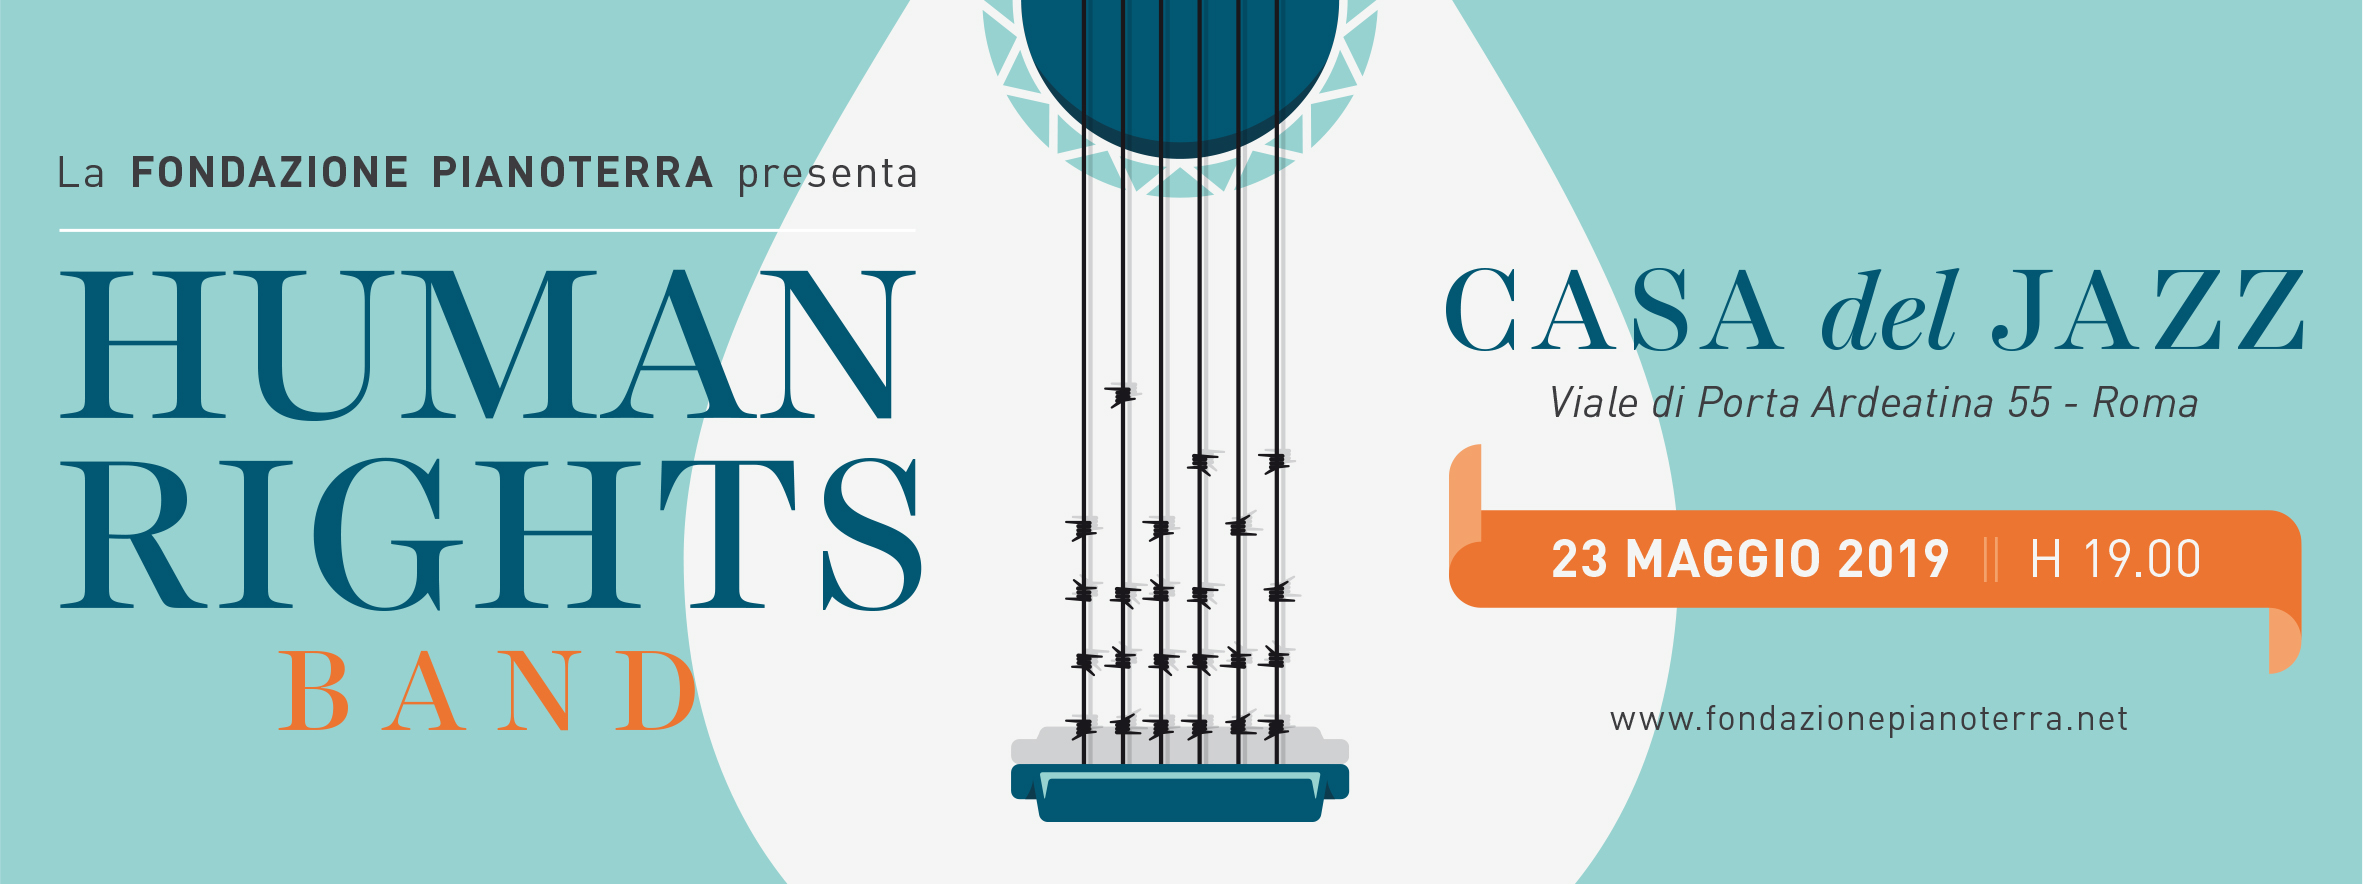 FondazionePianoterra_HumansRightsBand_Ticket_21x10.jpg